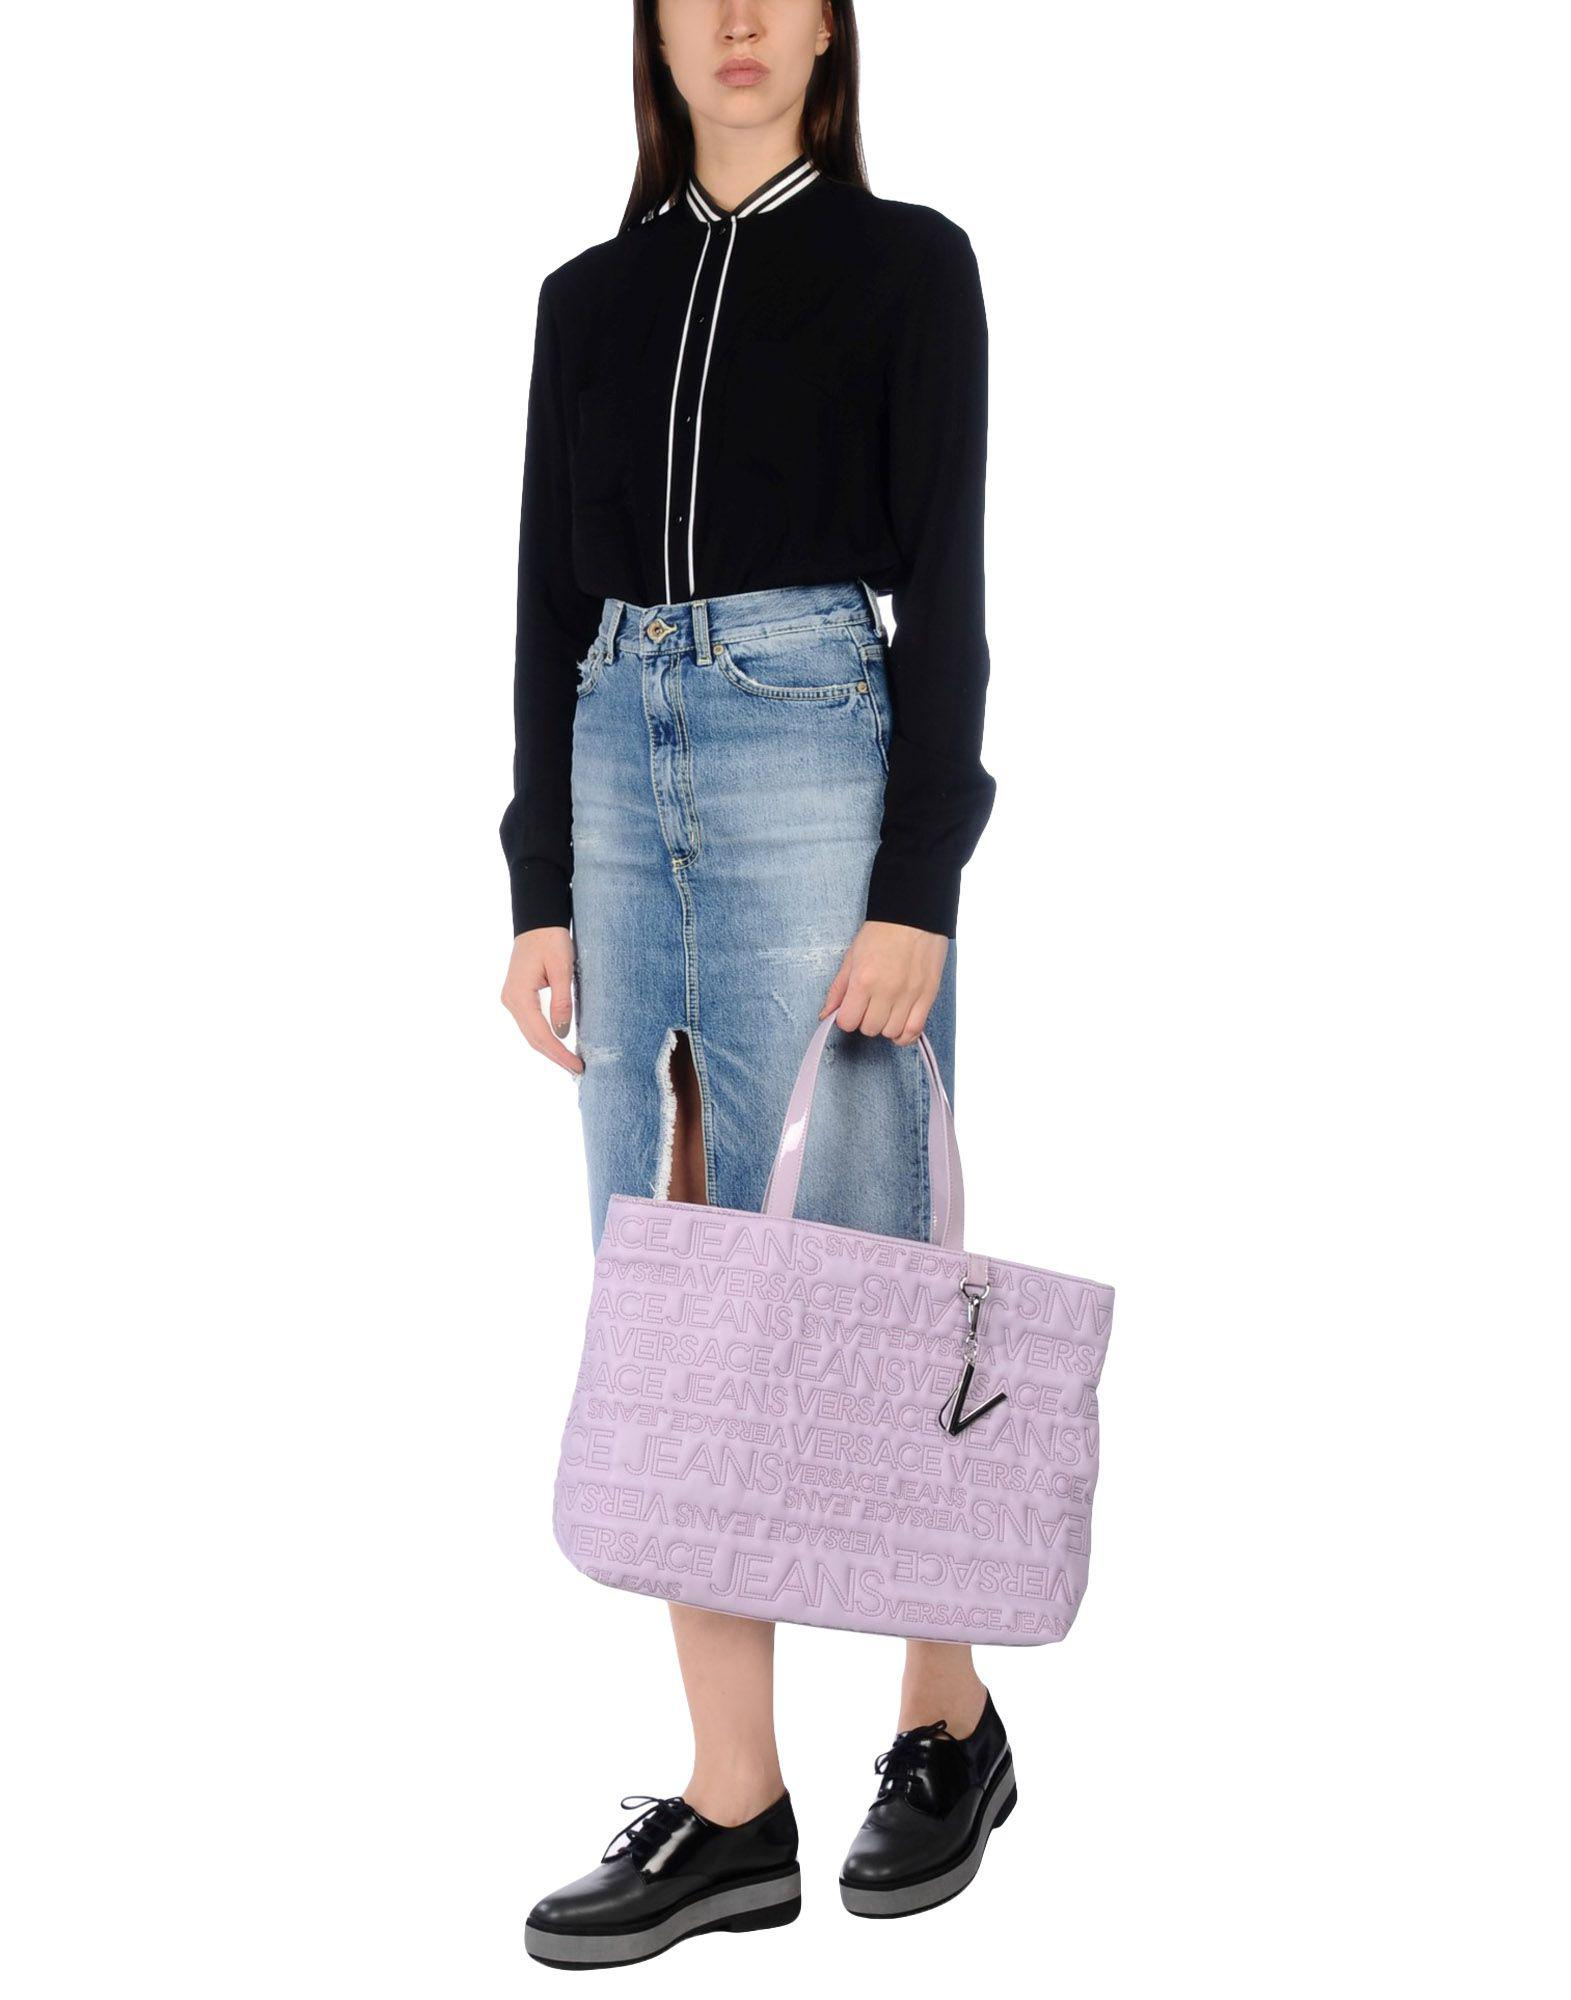 Versace Jeans Handbag in Purple - Lyst 90825f1326